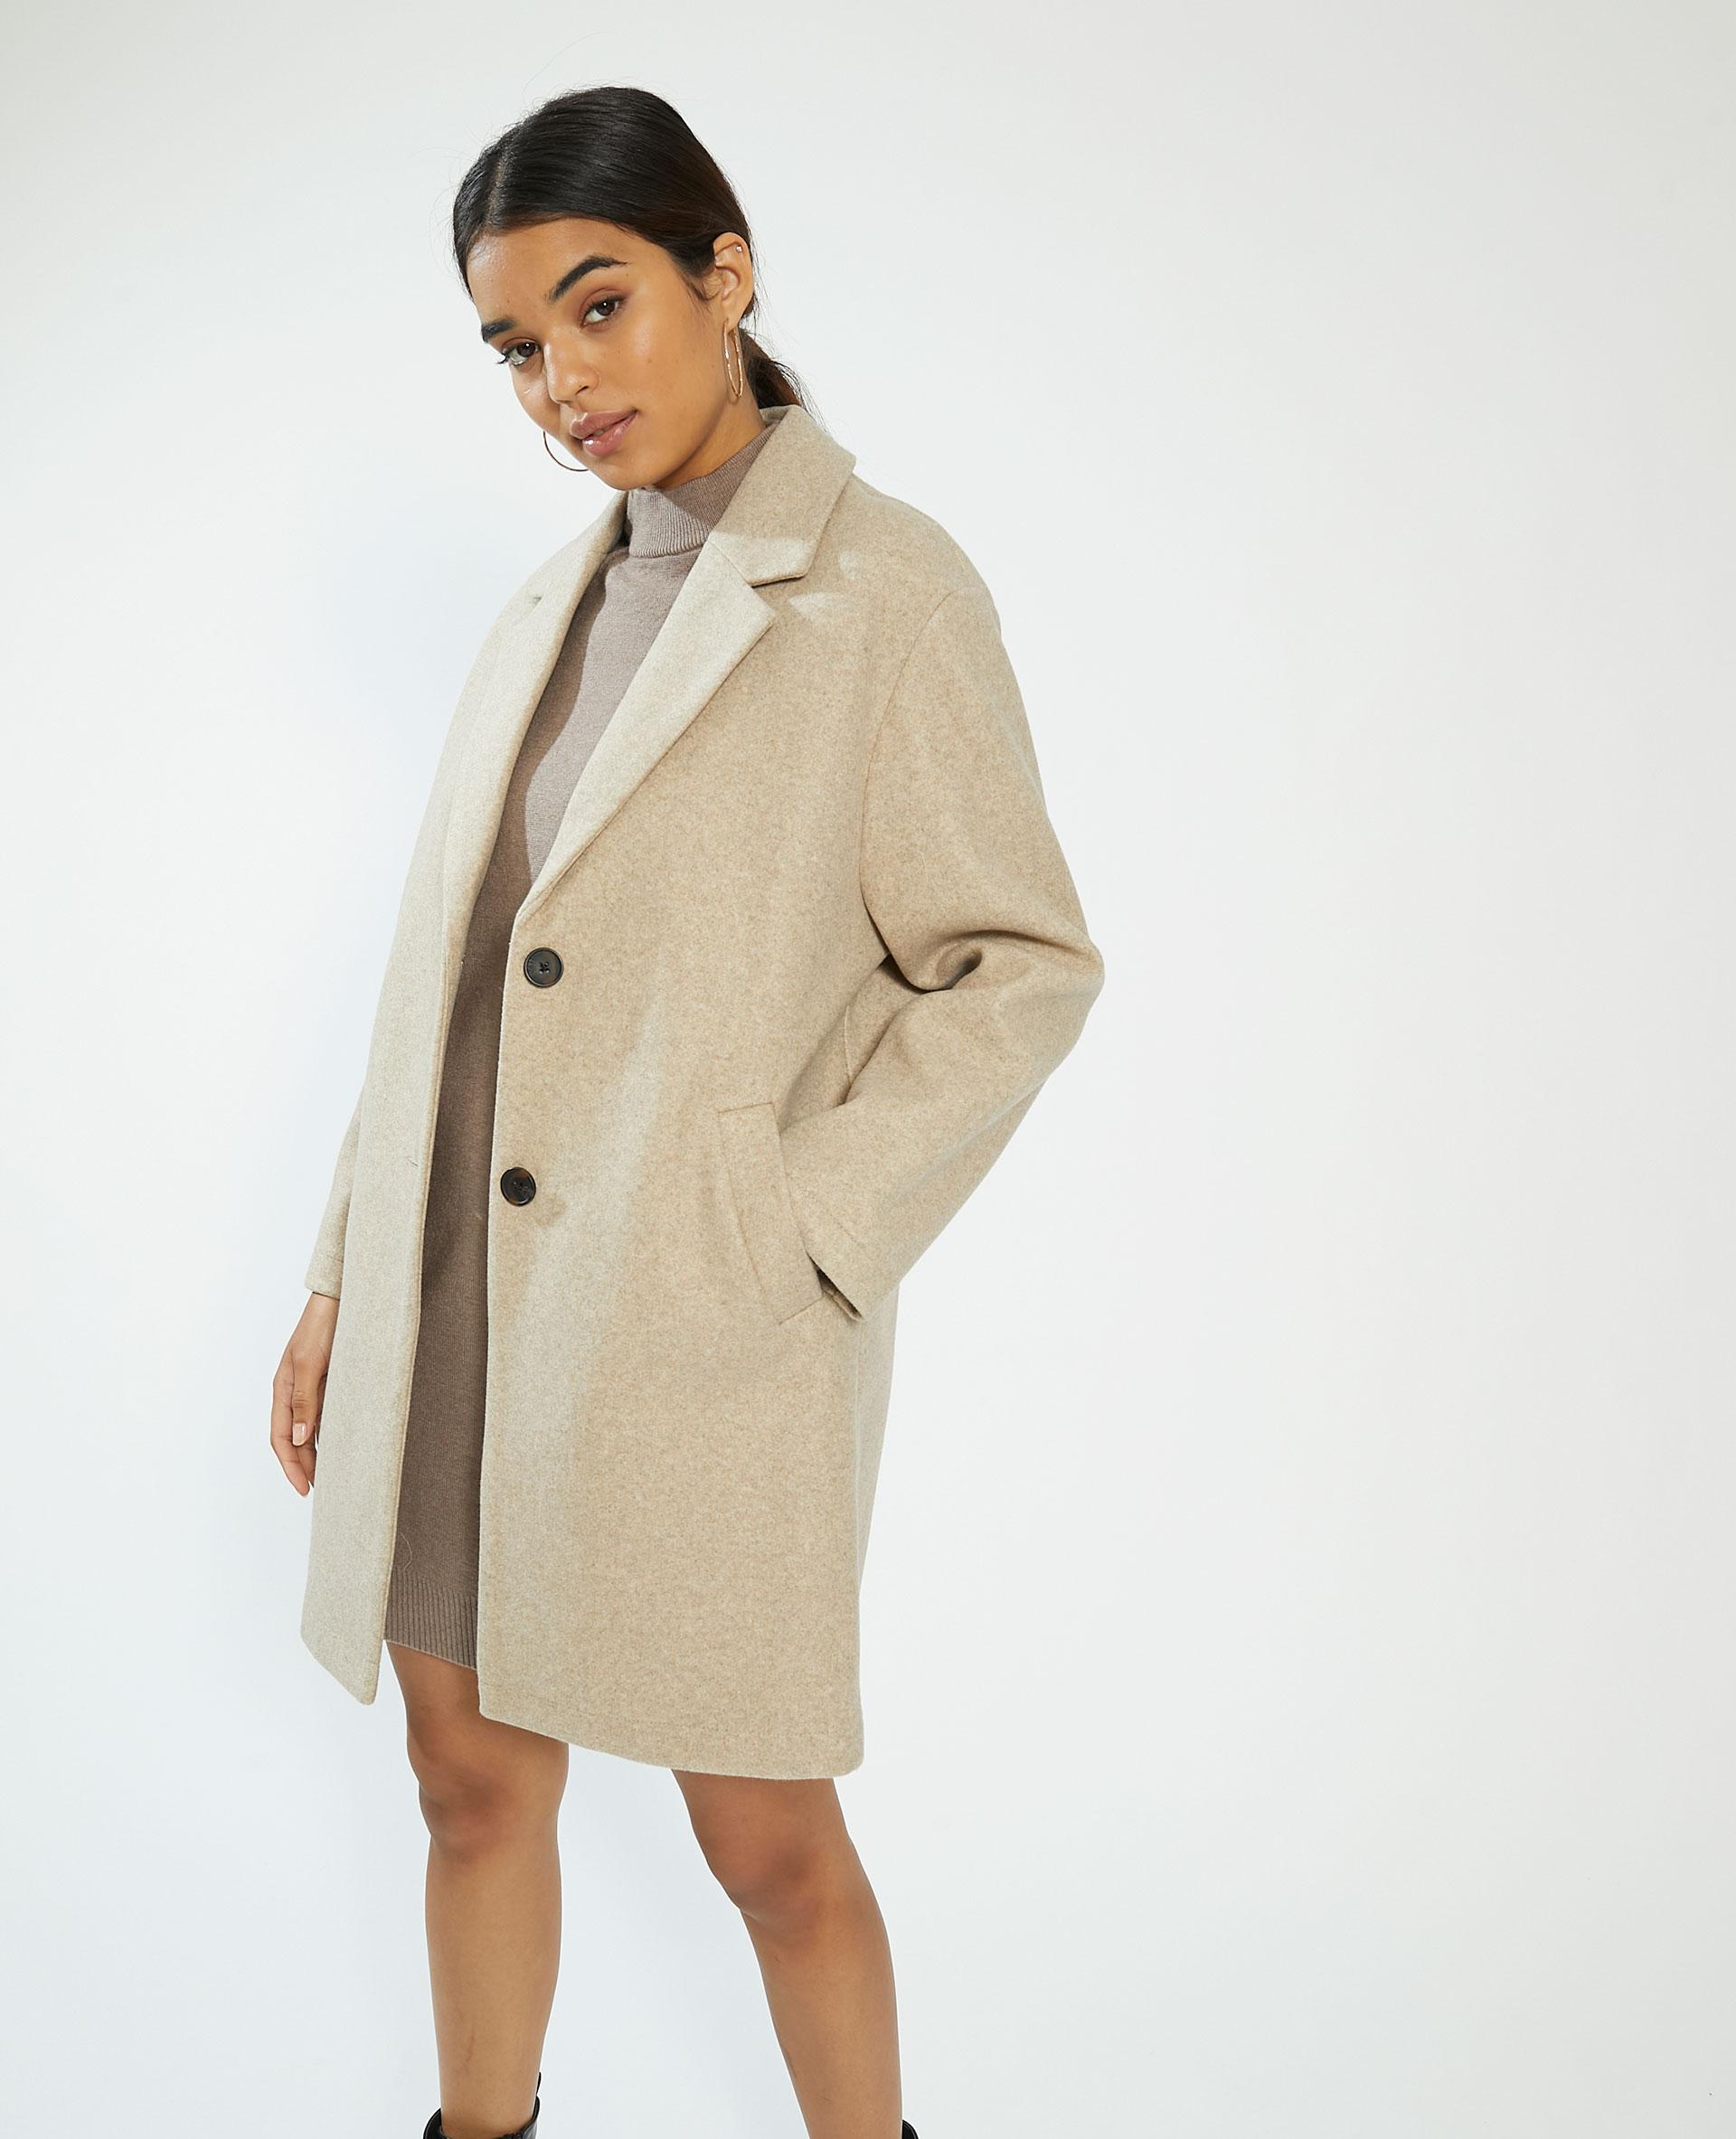 Manteau long beige - Pimkie